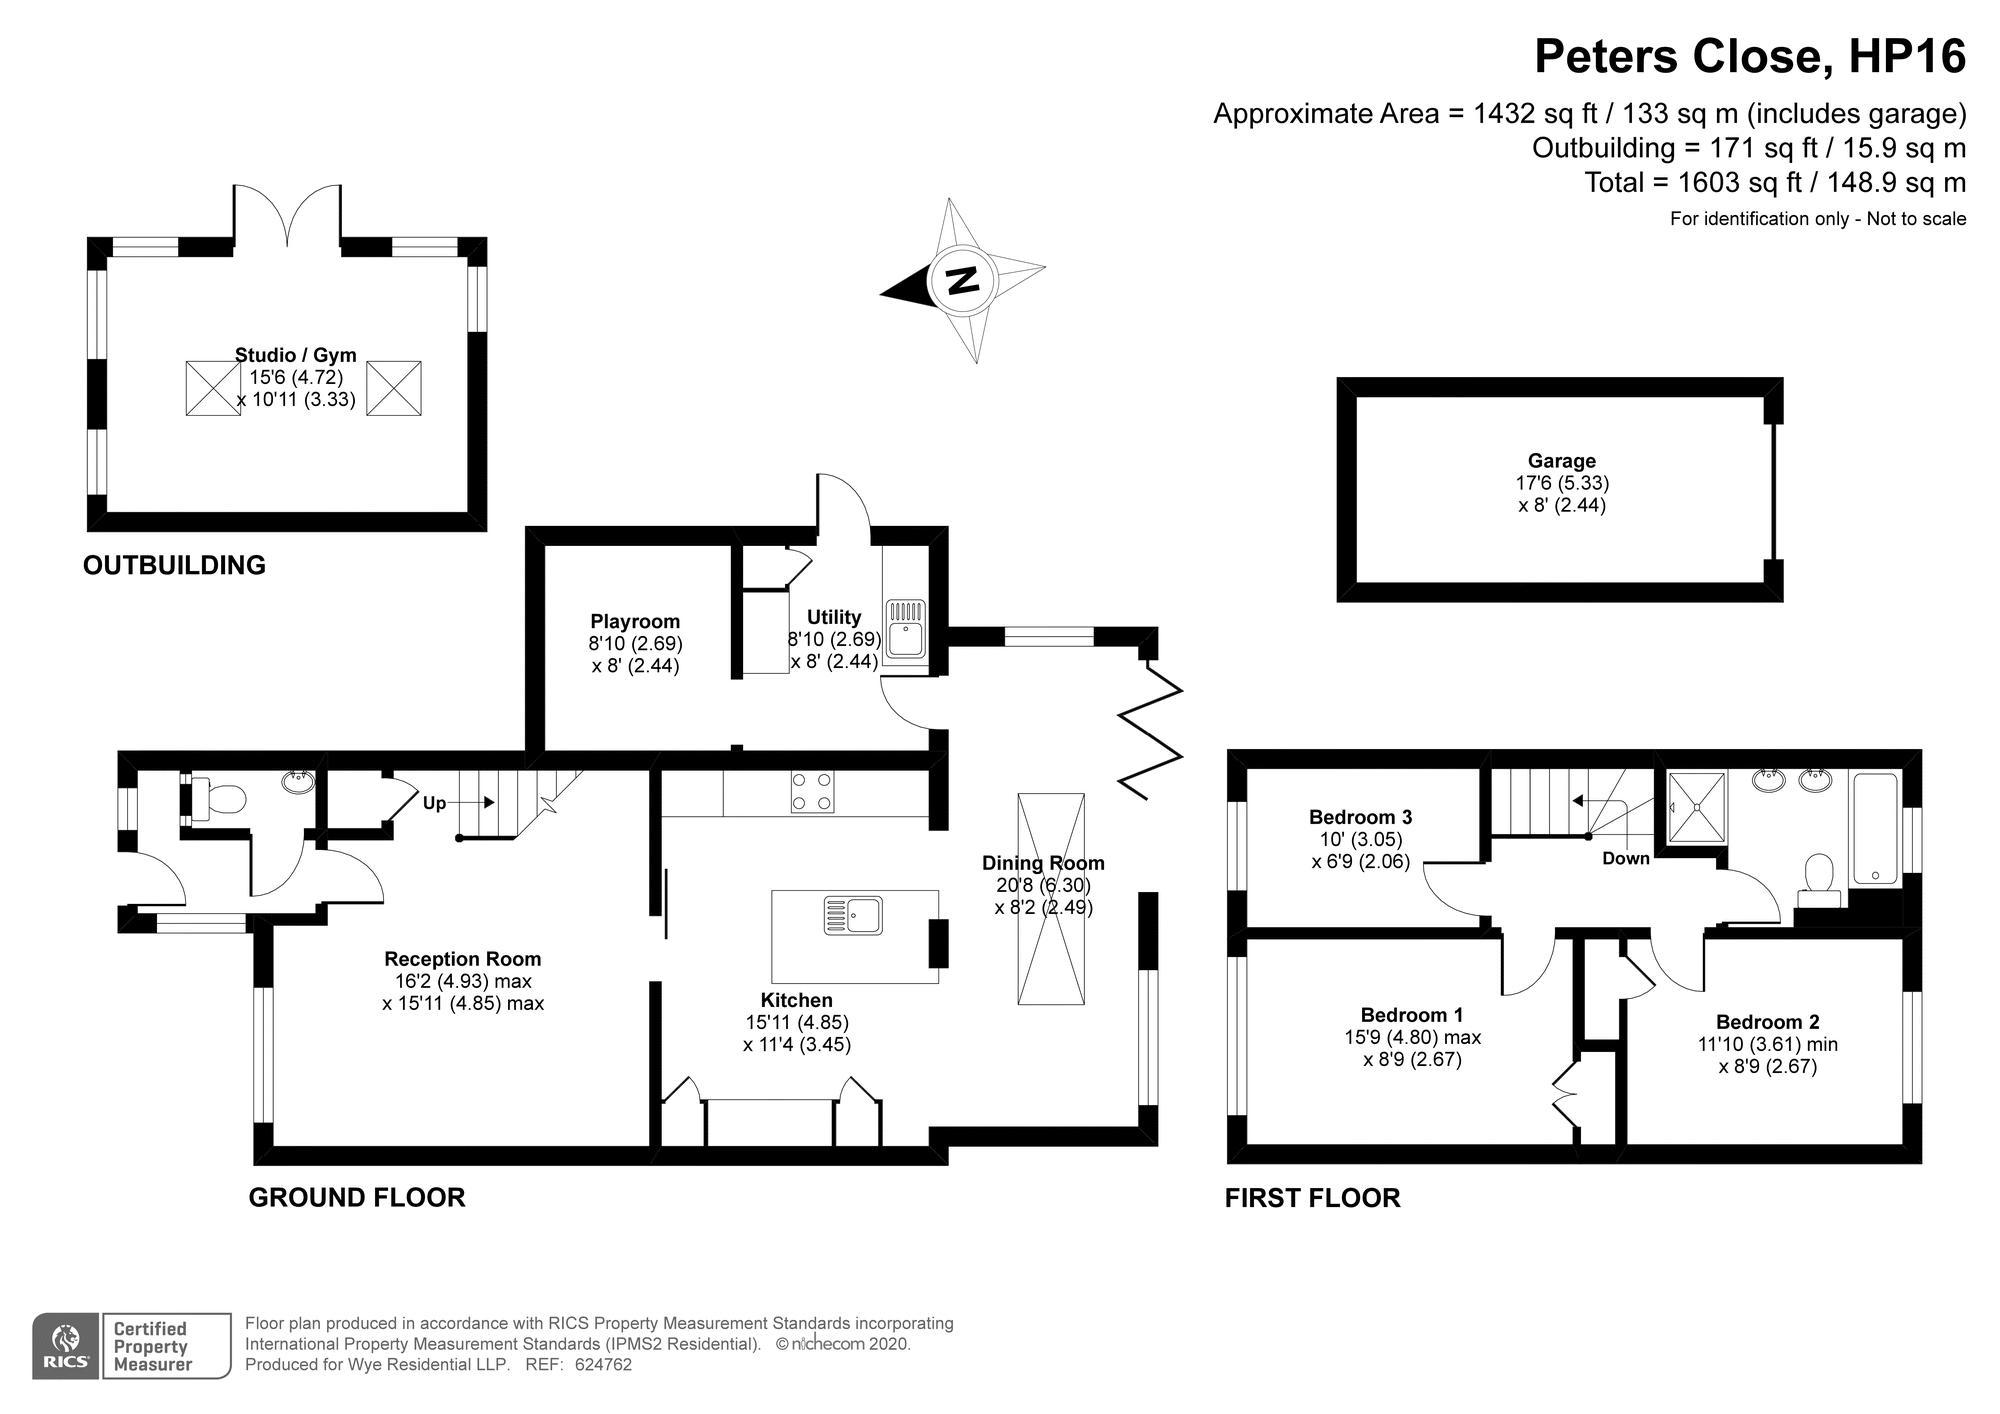 Peters Close